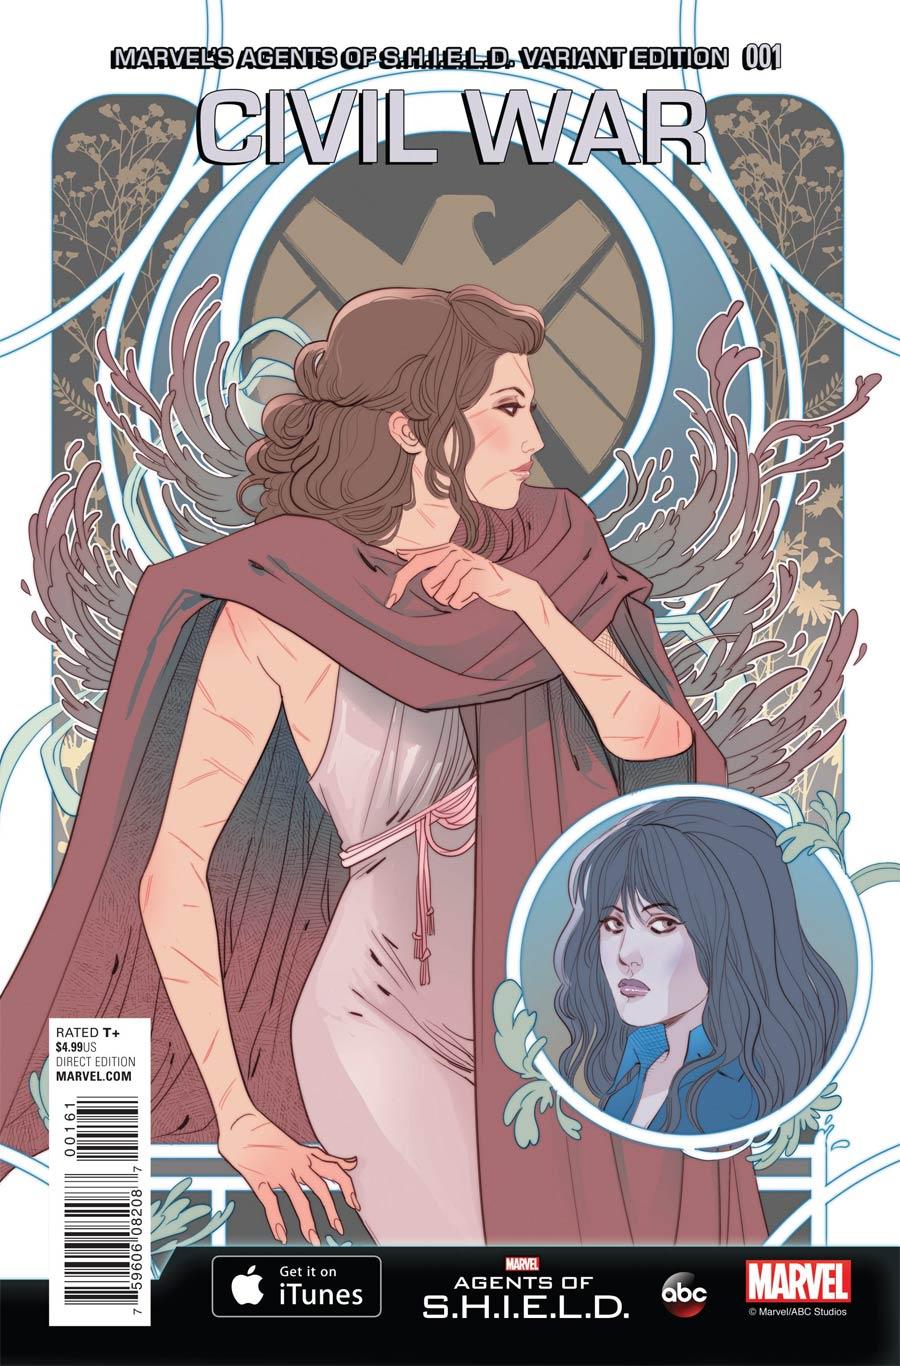 Civil War (Secret Wars) #1 Cover D Incentive Marvels Agents Of S.H.I.E.L.D. Variant Cover (Secret Wars Warzones Tie-In)